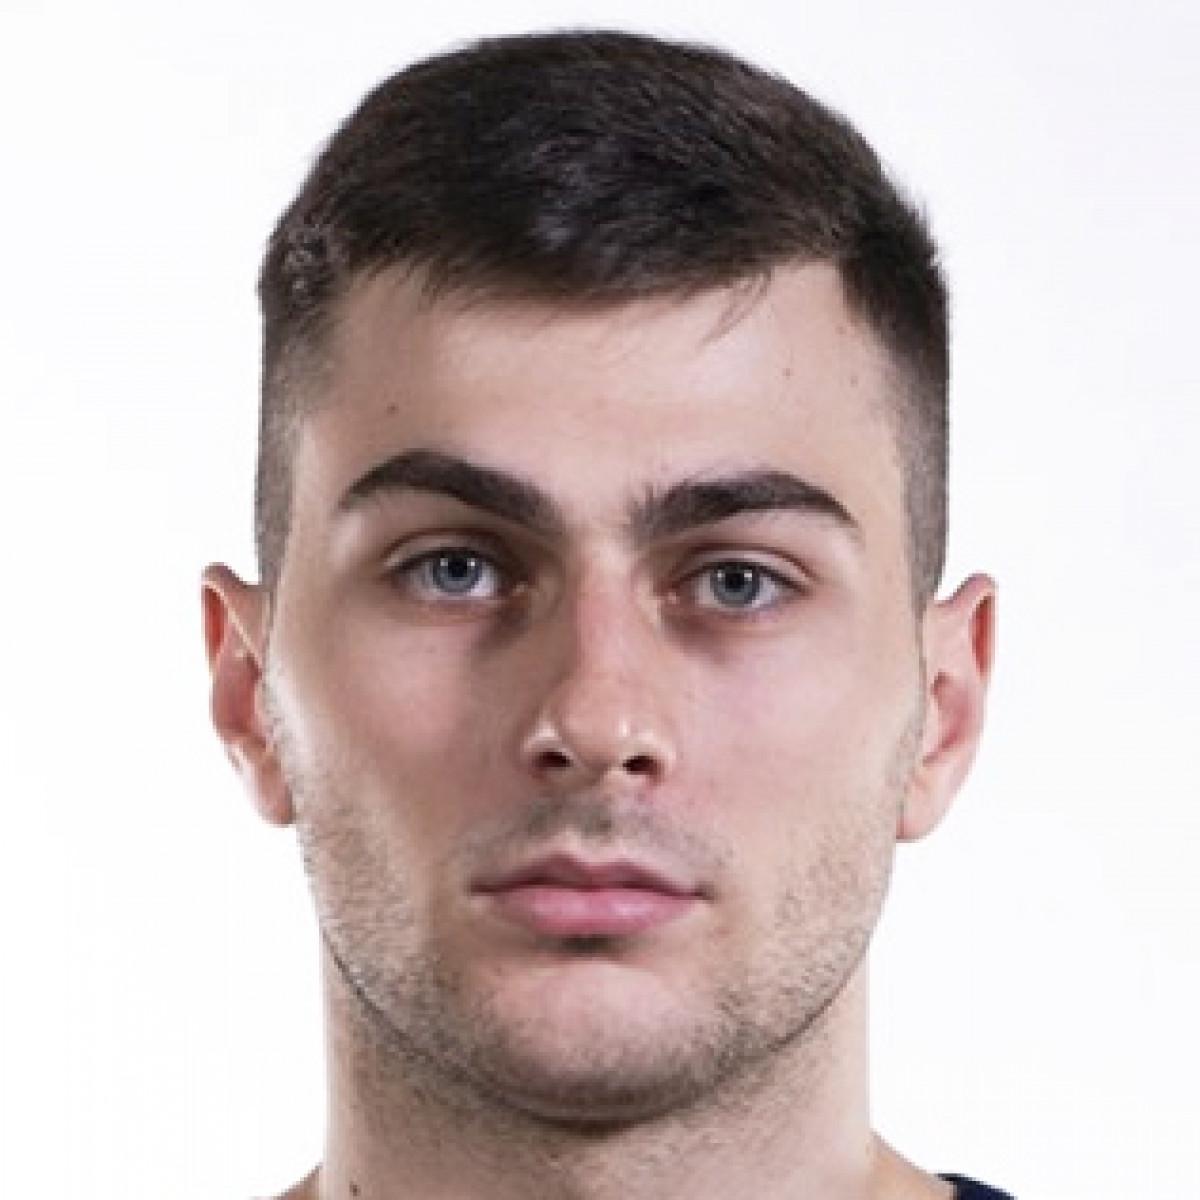 Lazar Grbovic